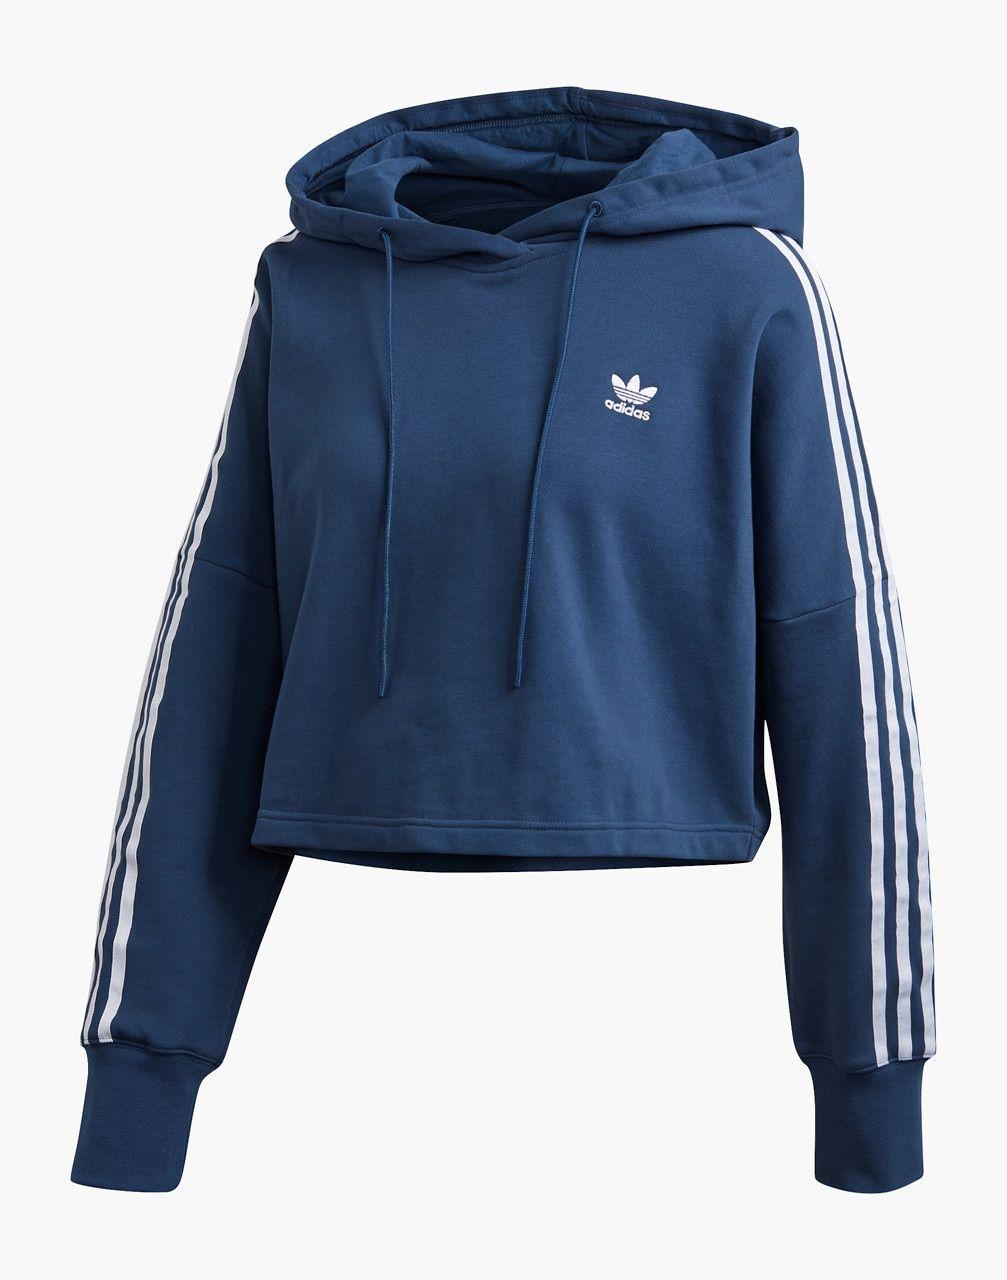 Predownload: Adidas Originals Cropped Hoodie Sweatshirt In 2020 Women Hoodies Sweatshirts Crop Sweatshirt Hoodie Adidas Cropped Hoodie [ 1280 x 1007 Pixel ]